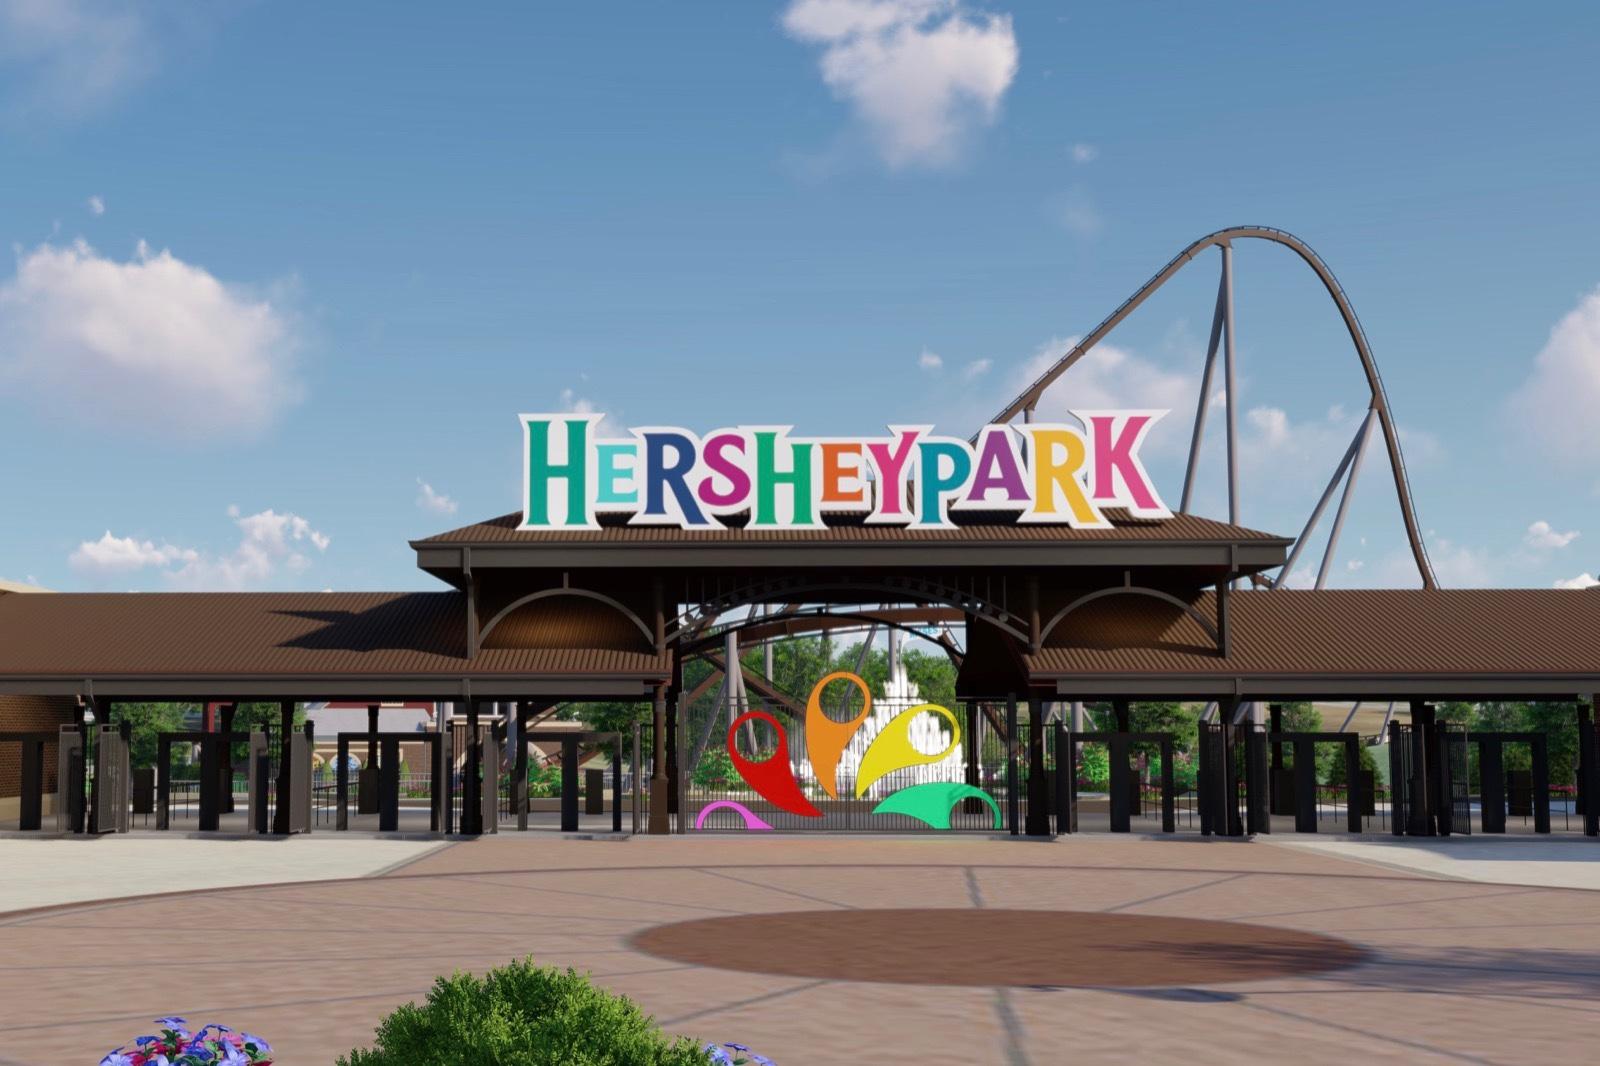 Hershey park discount tickets 2020